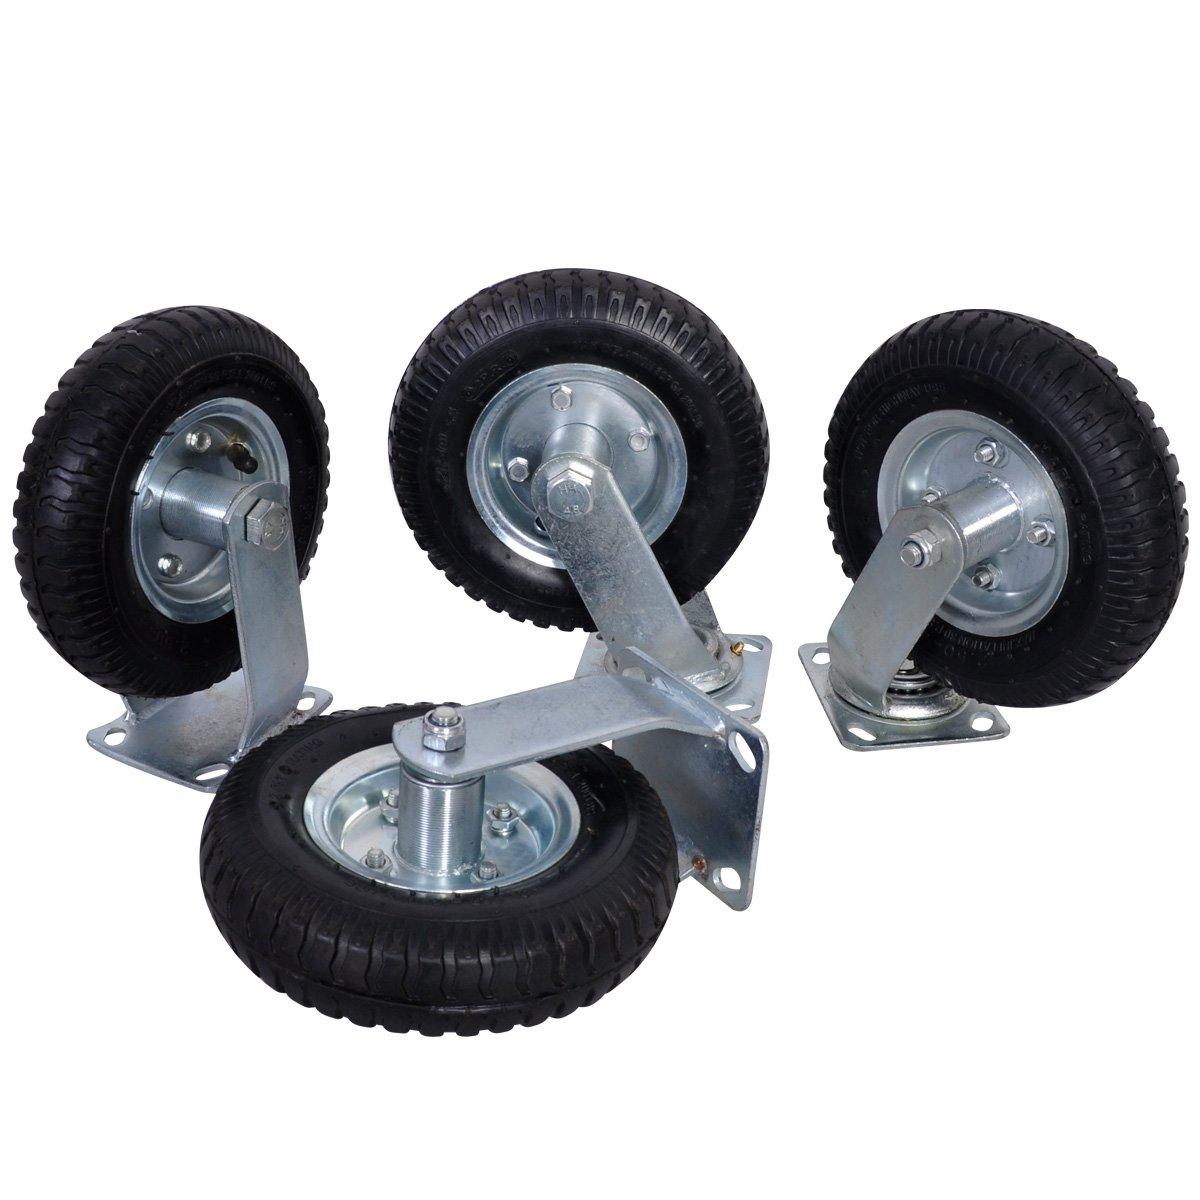 4 PCS 8'' Air Tire Pneumatic 2 Rigid Wheels & 2 Swivel Casters Cart Farm Caster